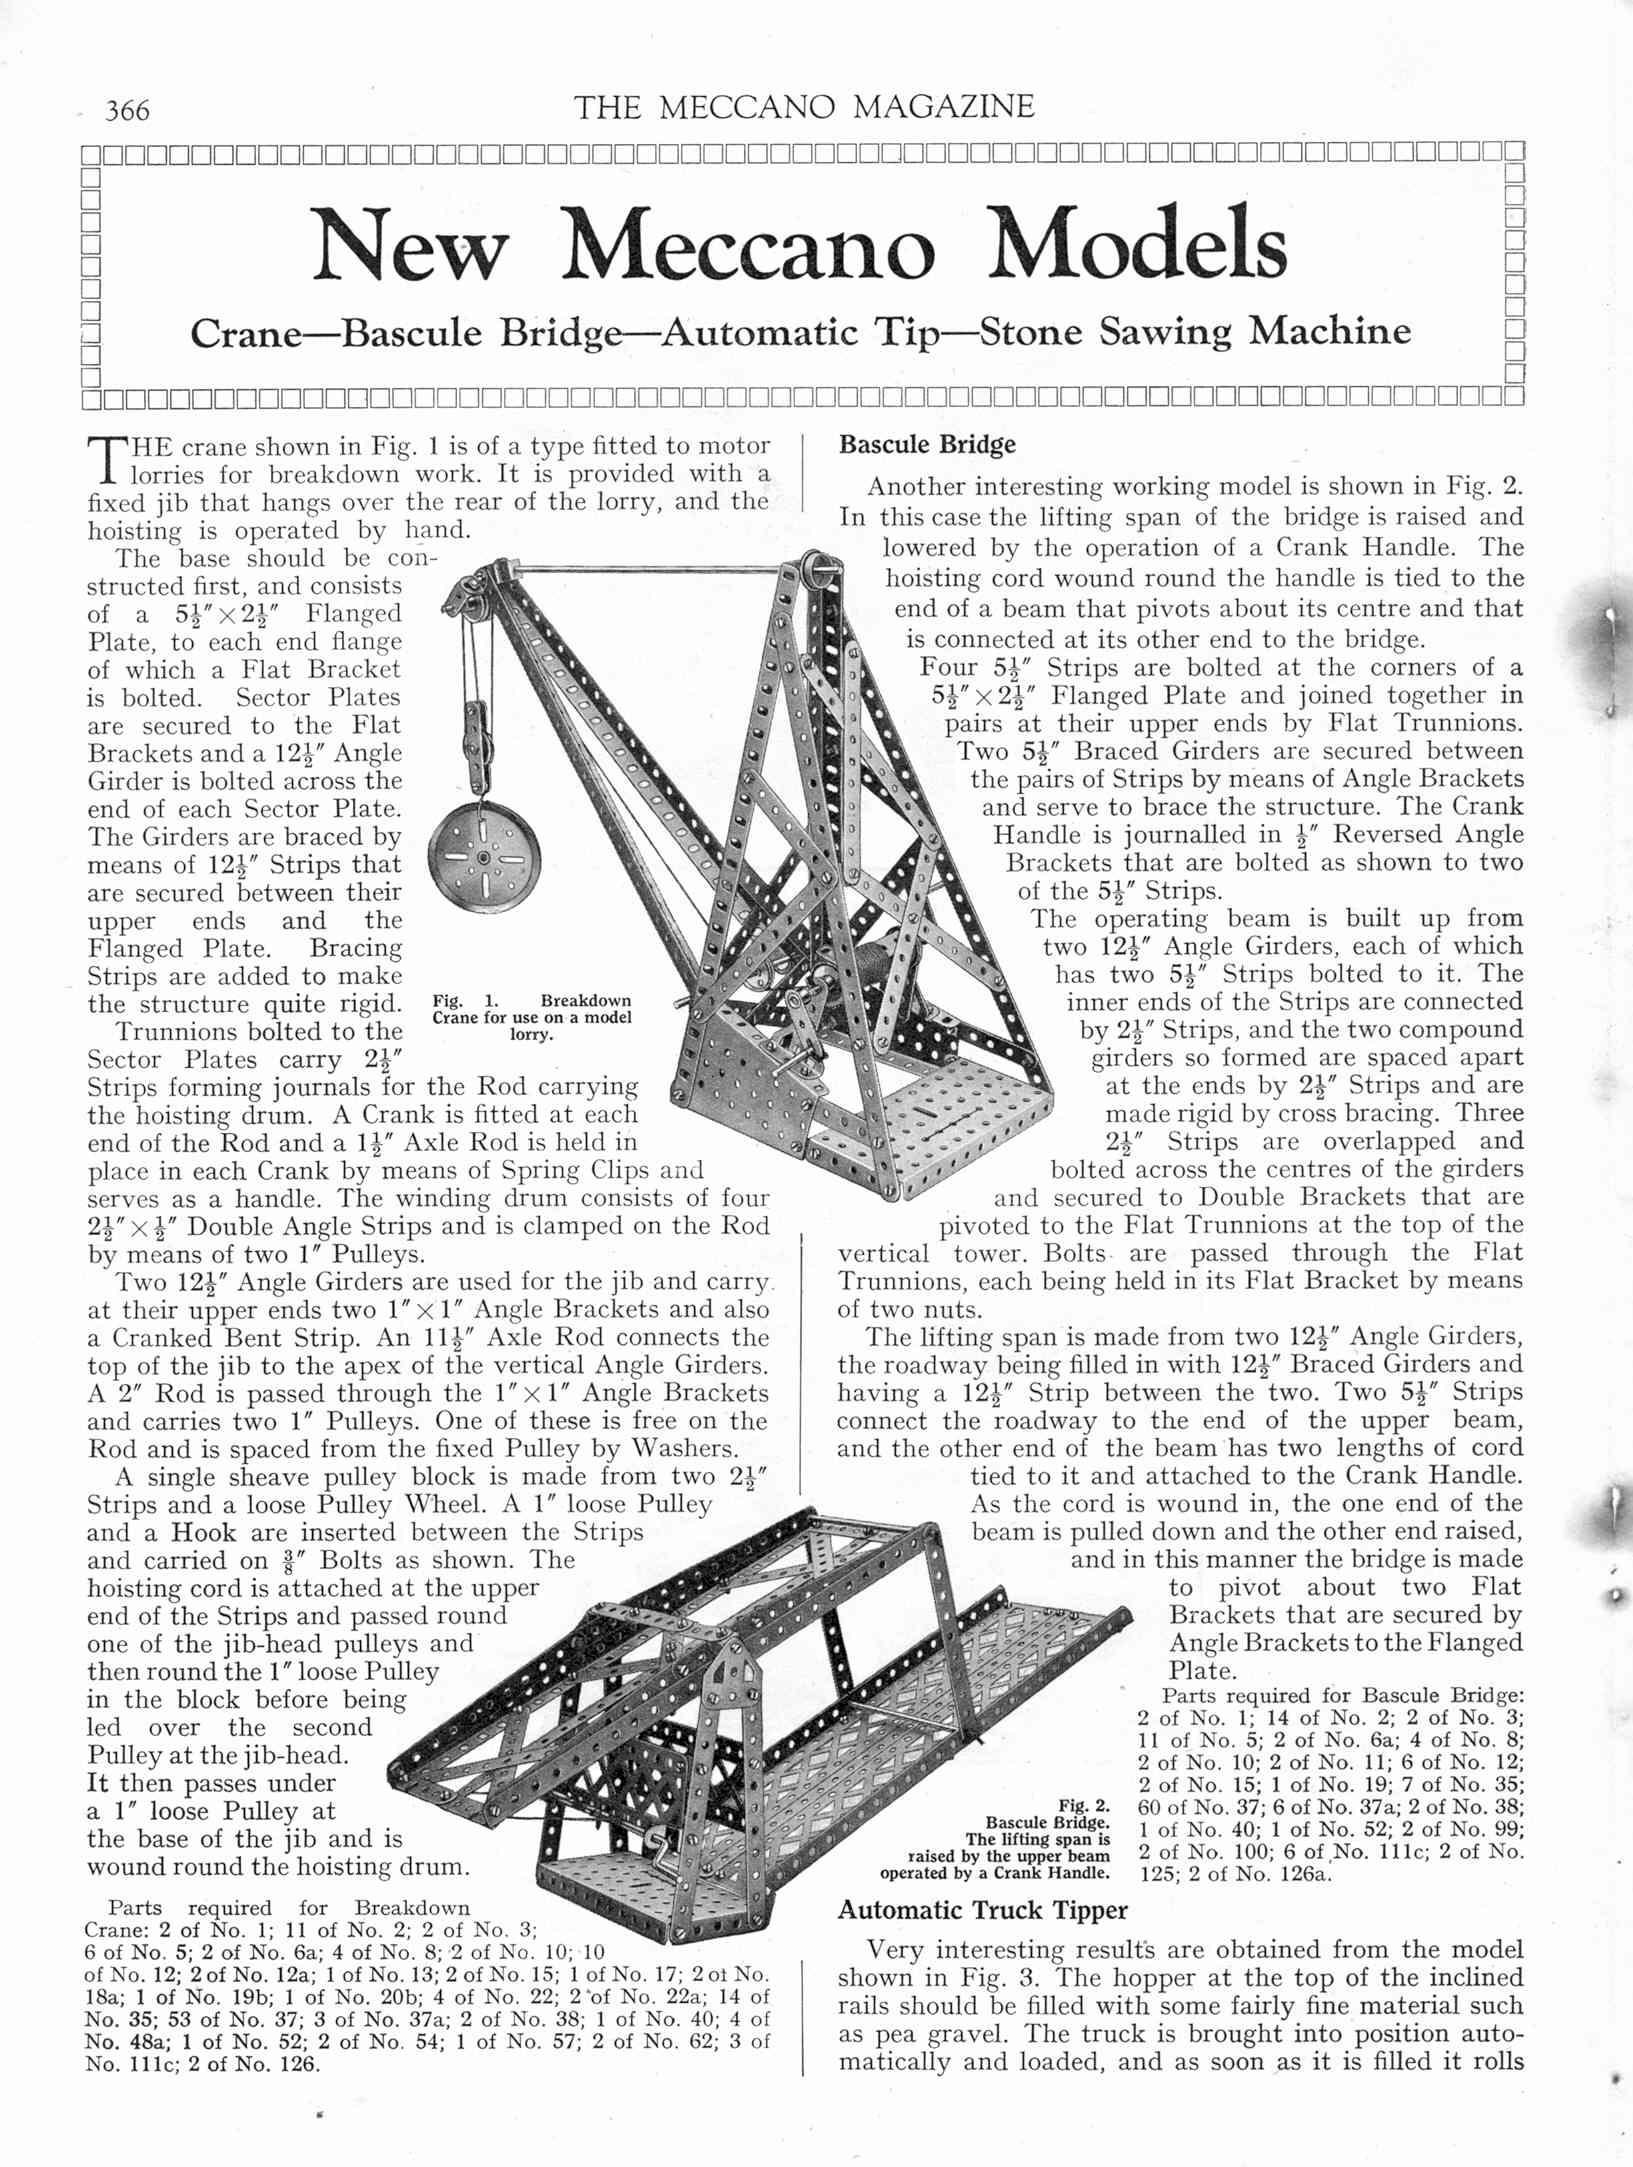 UK Meccano Magazine June 1935 Page 366